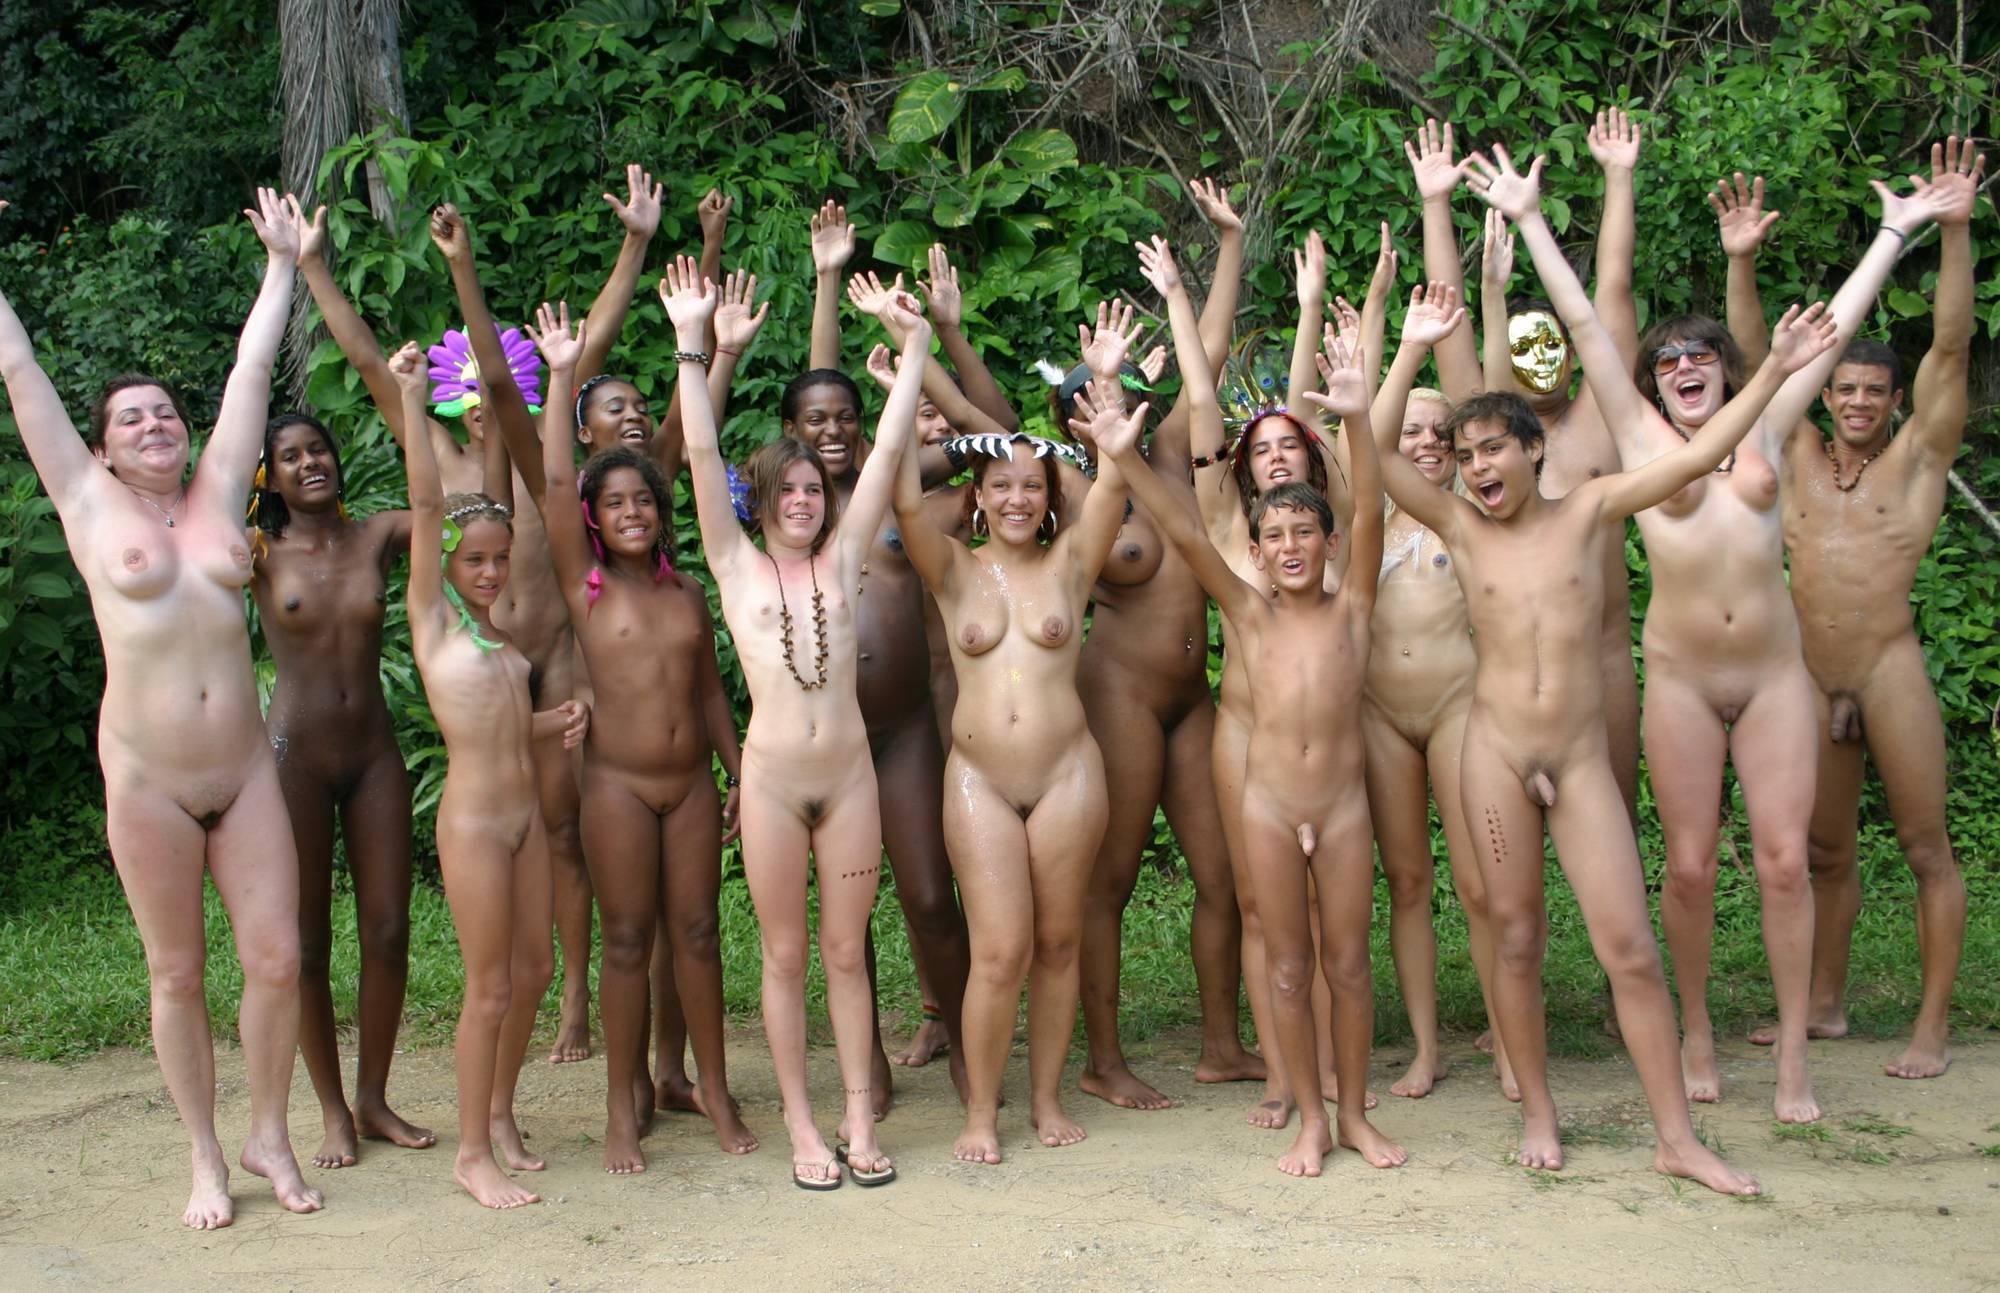 Brazilian PN Banner Group - 2